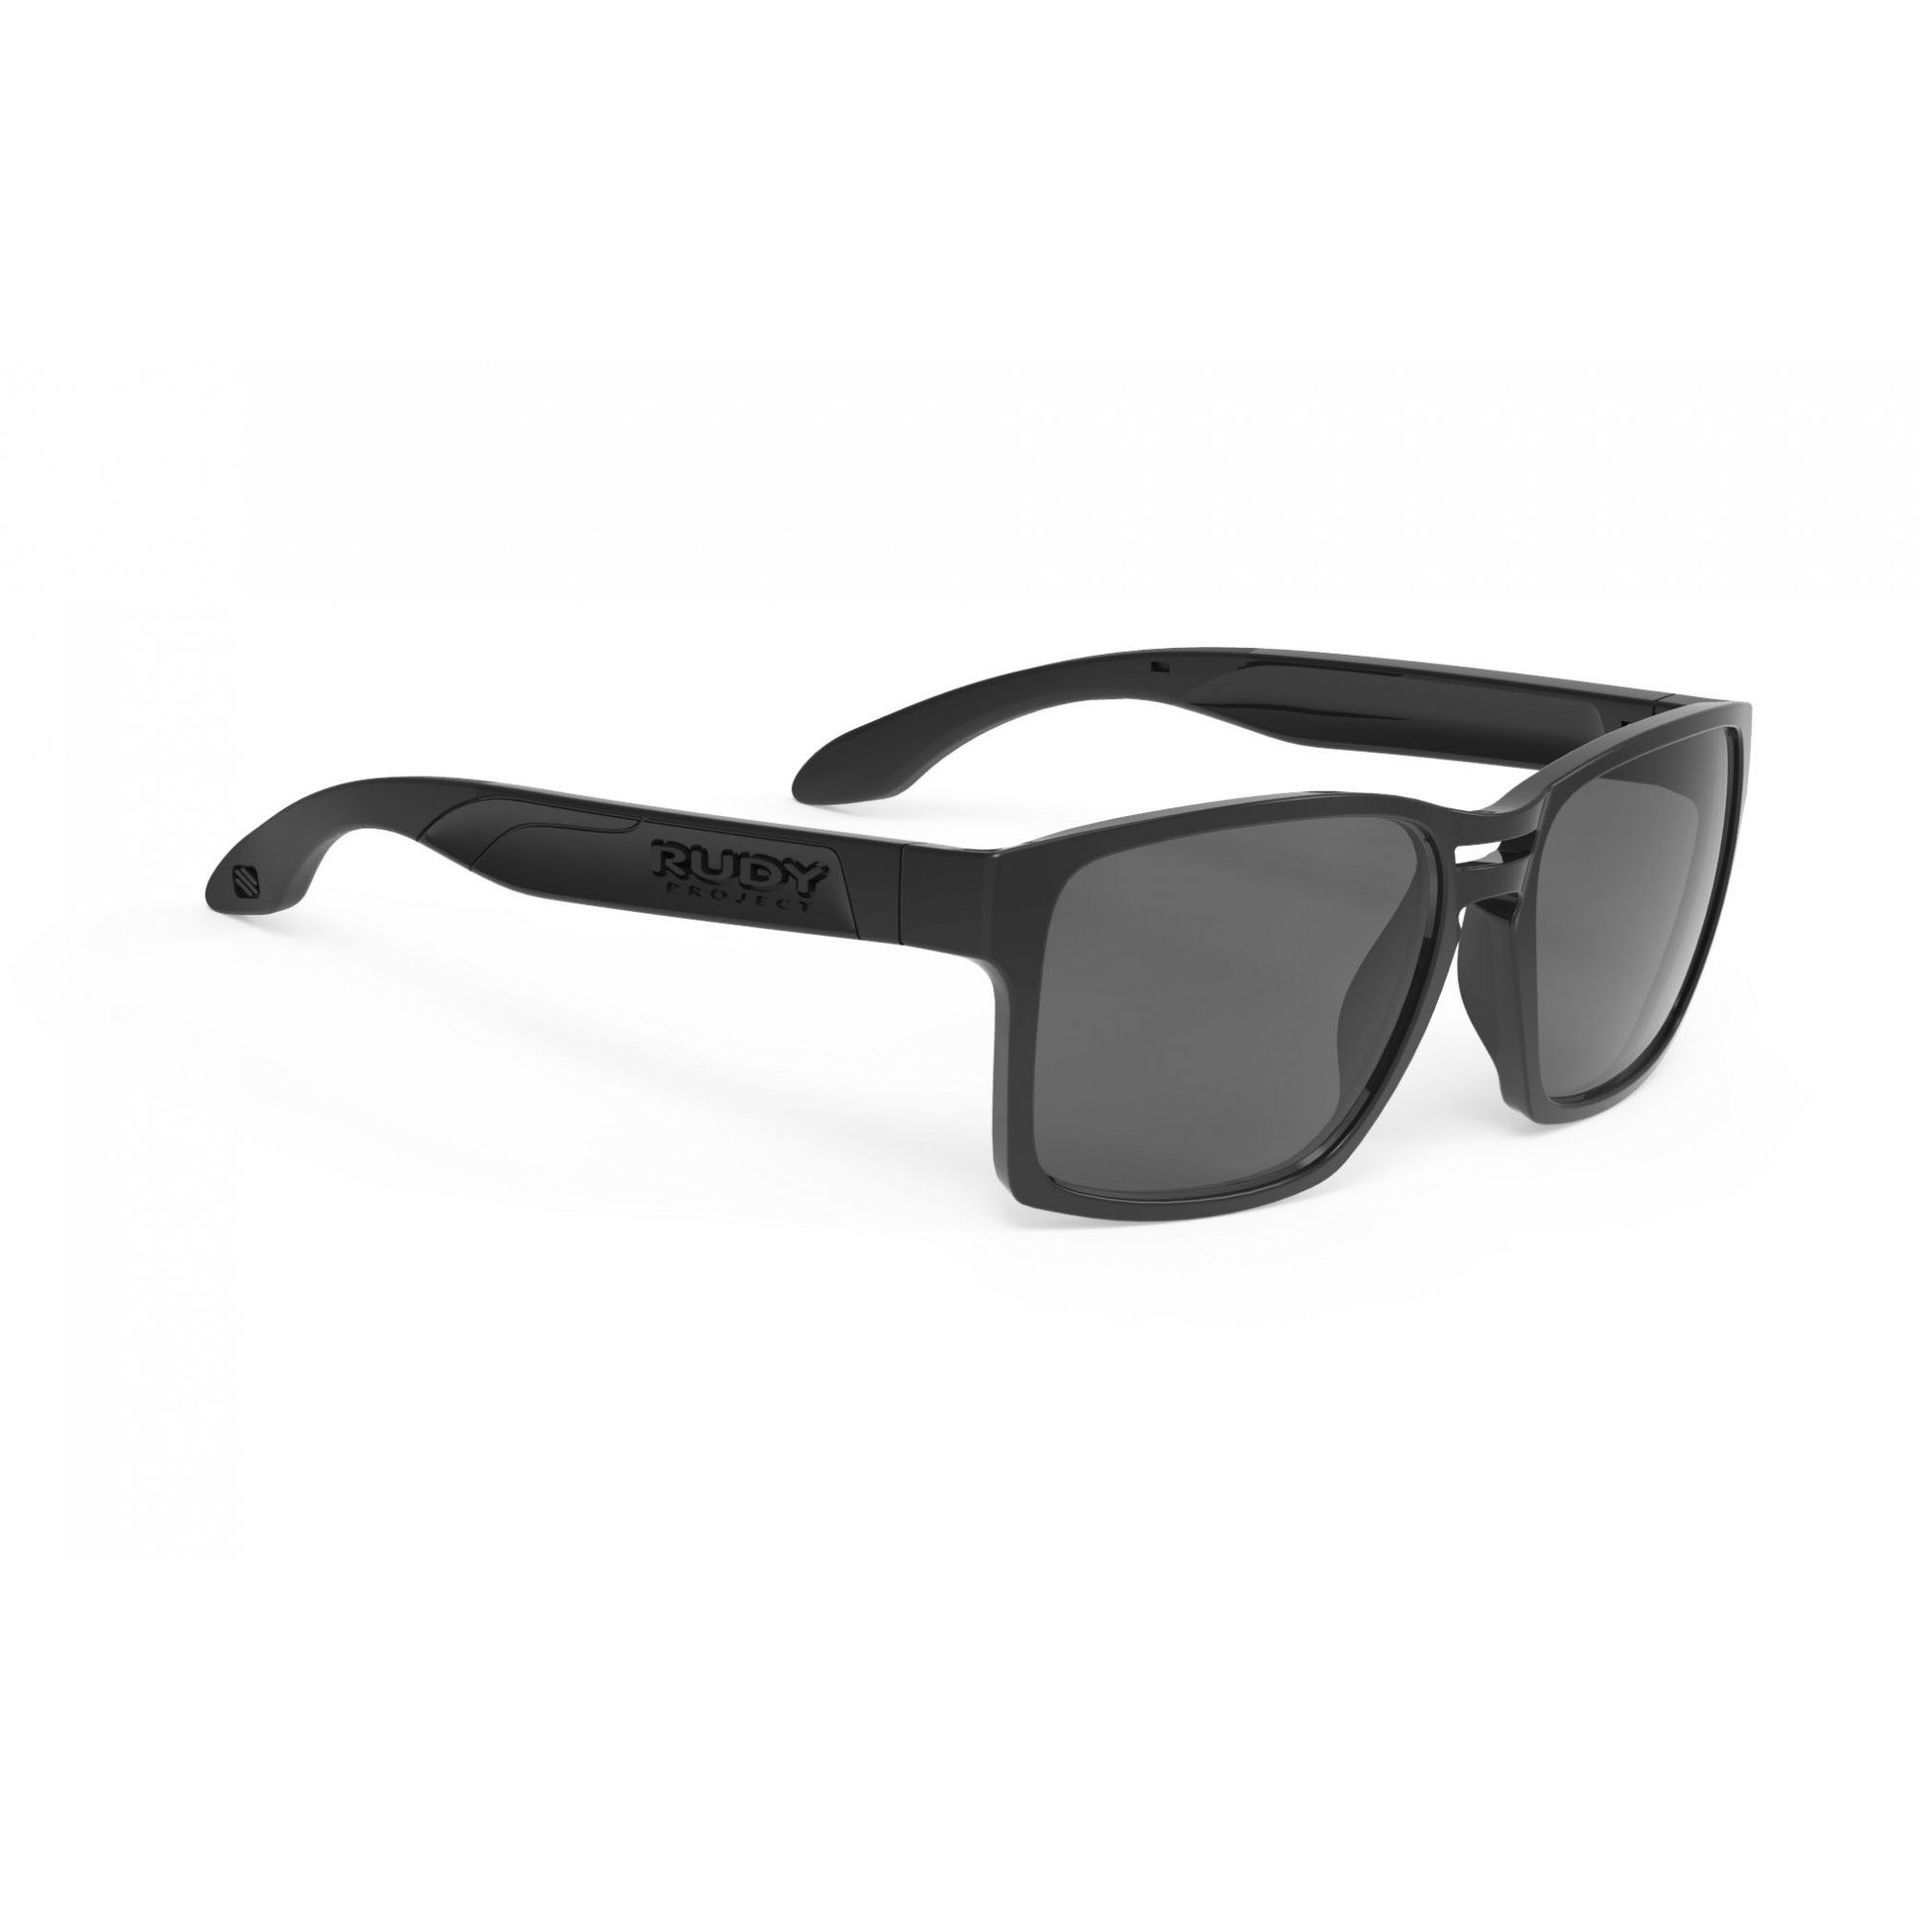 OKULARY RUDY PROJECT SPINAIR 57 BLACK + SMOKE BLACK SP571042 1